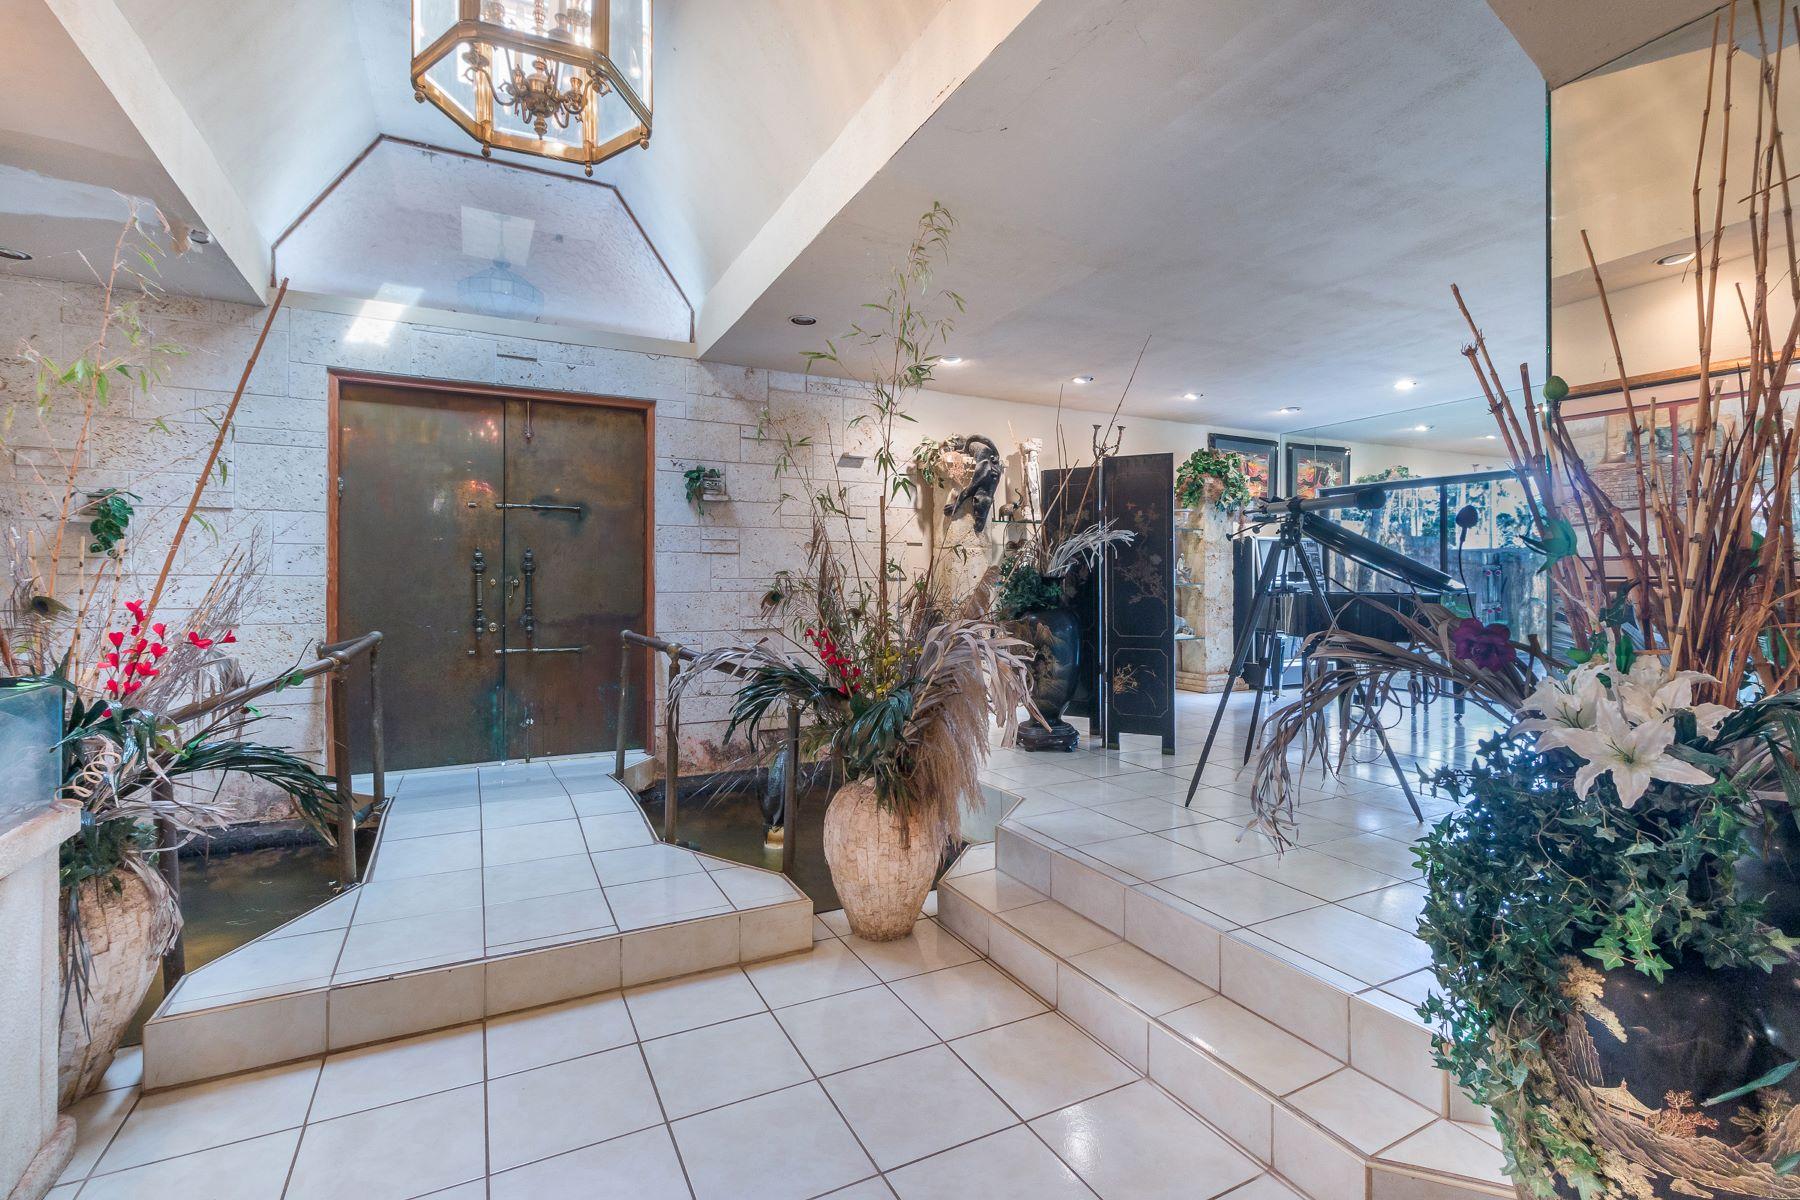 Single Family Home for Sale at 460 Ne 154th St 460 Ne 154th St Miami, Florida 33162 United States